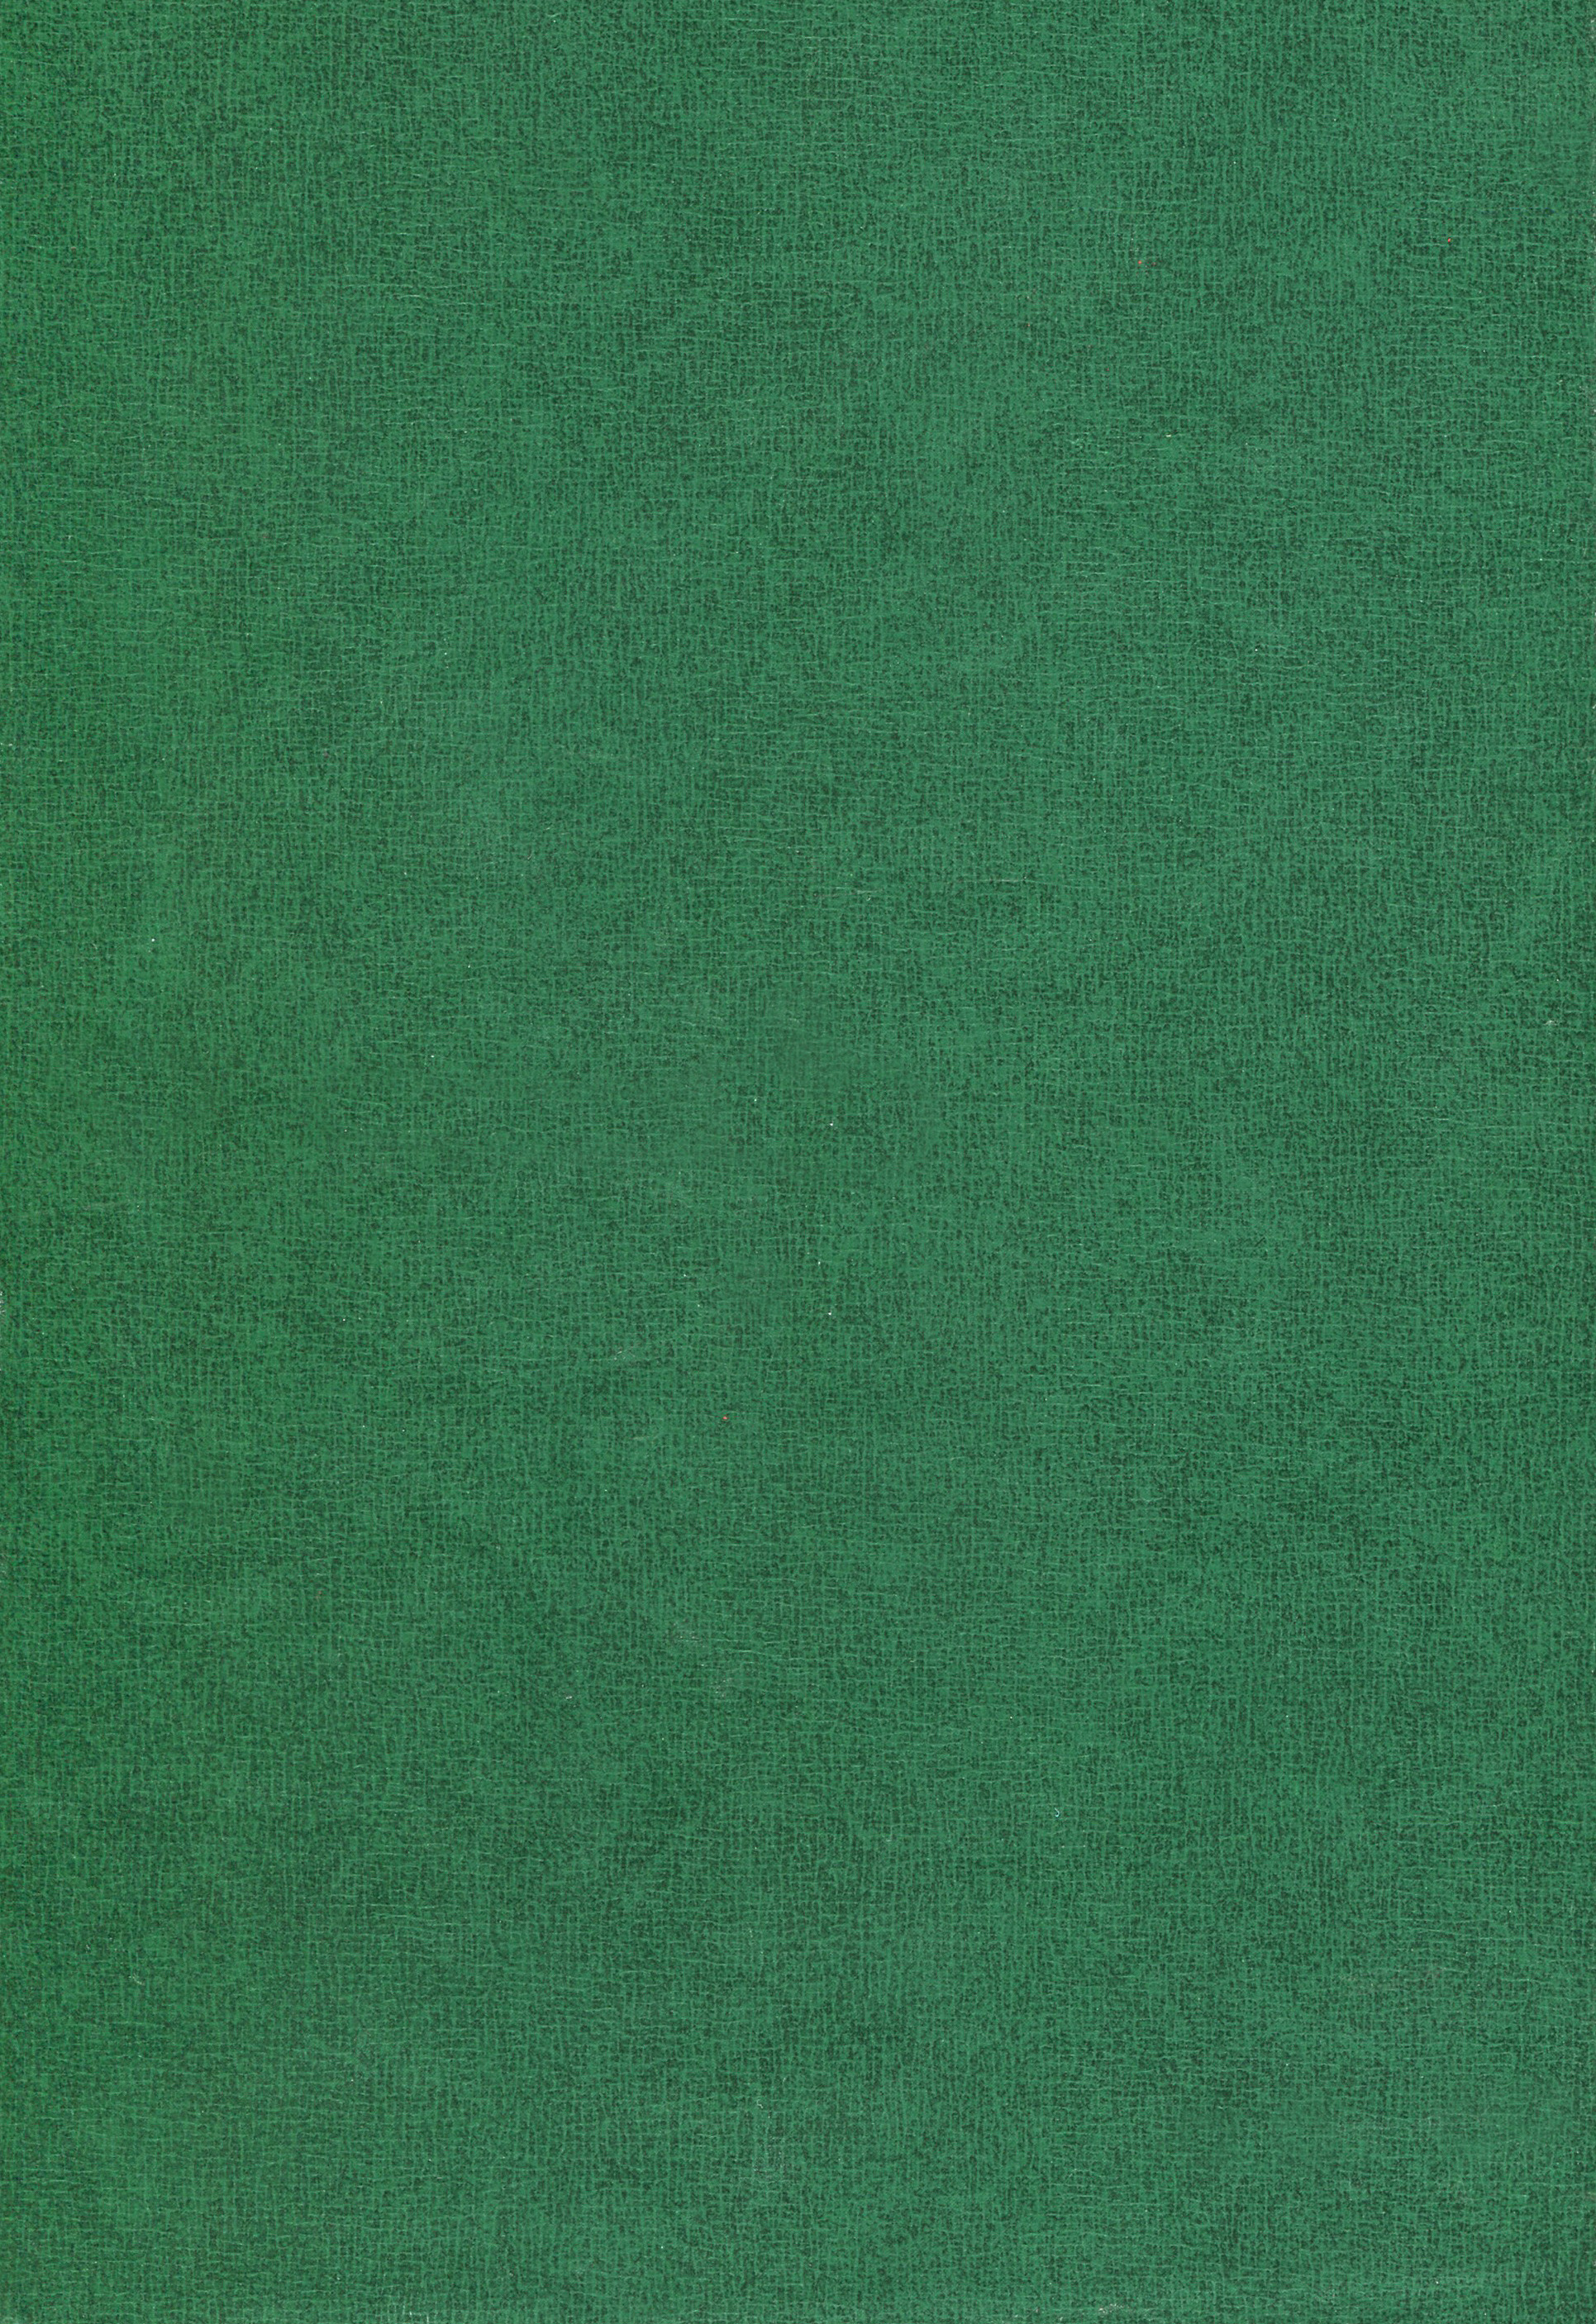 Book Cover Texture Photo ~ Textures by schreibstang on deviantart